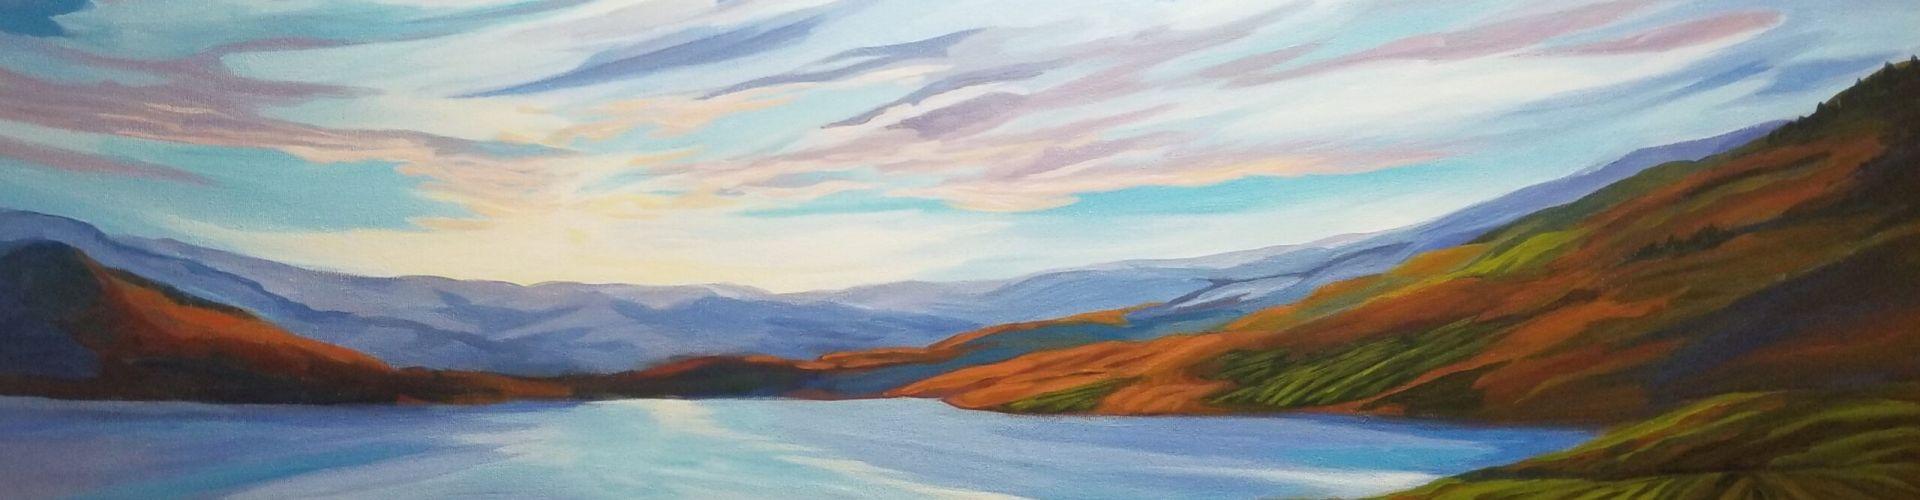 Morning Has Broken acrylic painting of a view of Naramata Bench by Canadian artist Linda Lovisa